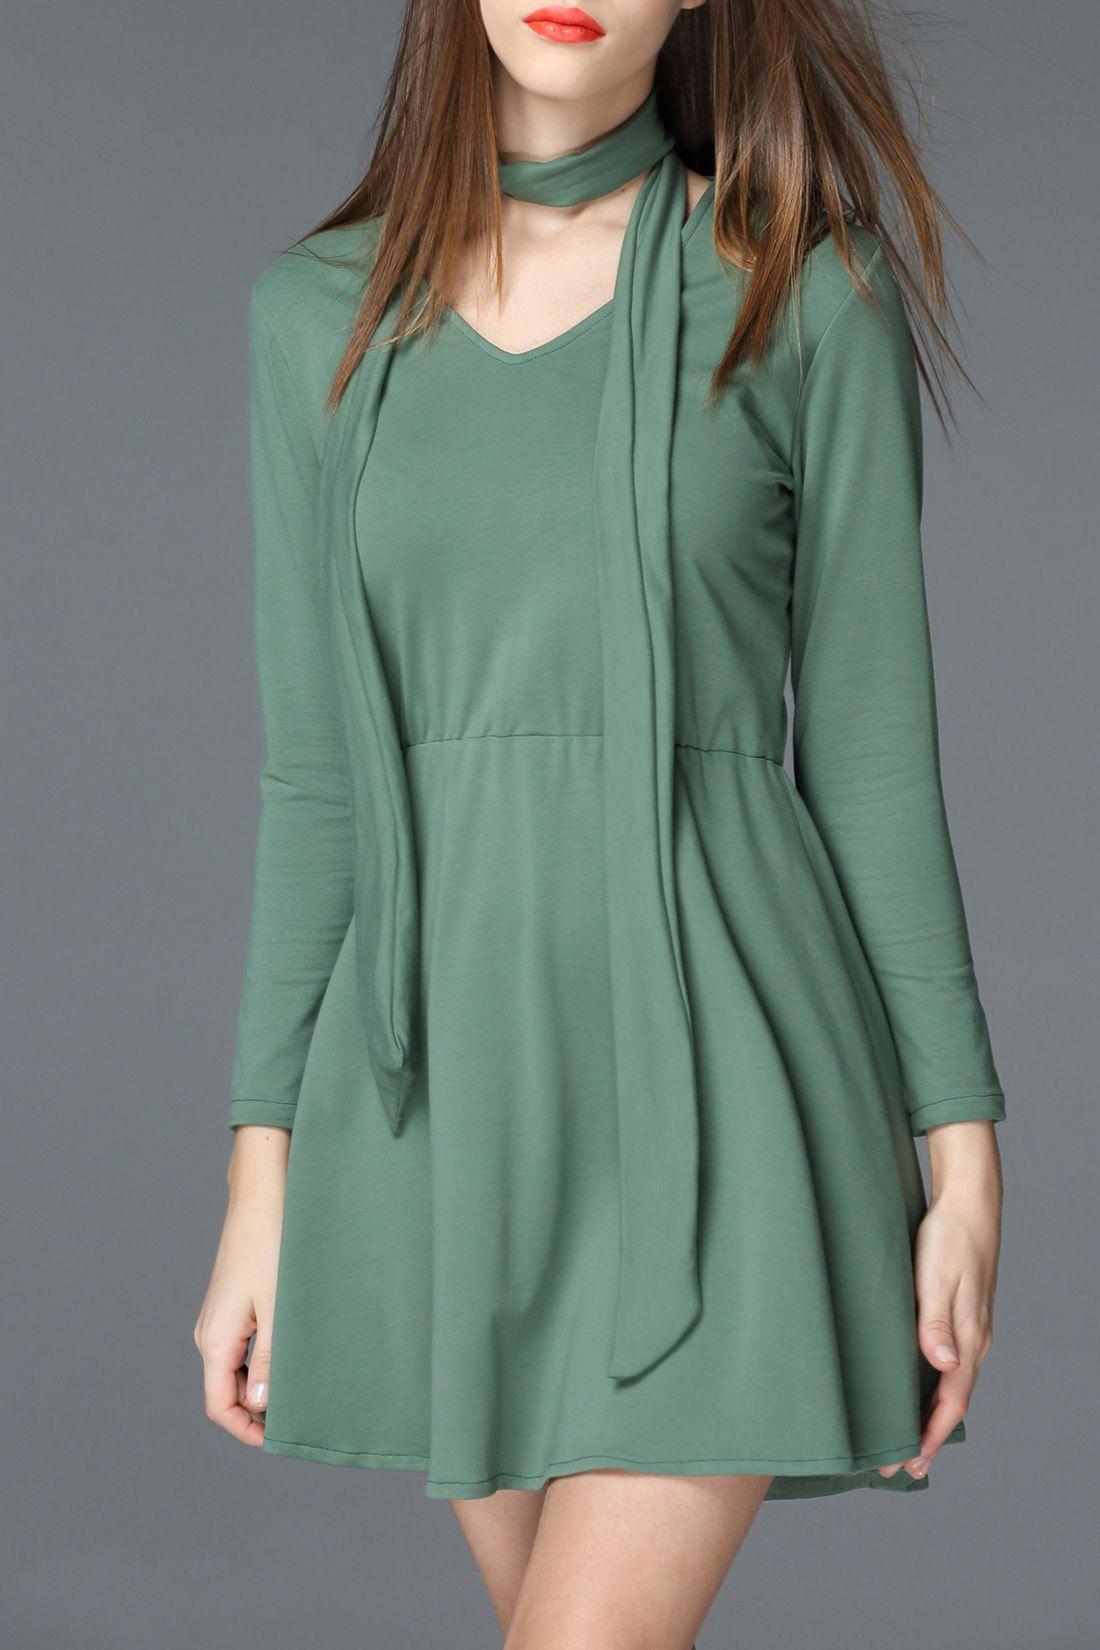 Oserjep Pea Green Tie Design Solid Color Dress Mini Dresses At Dezzal